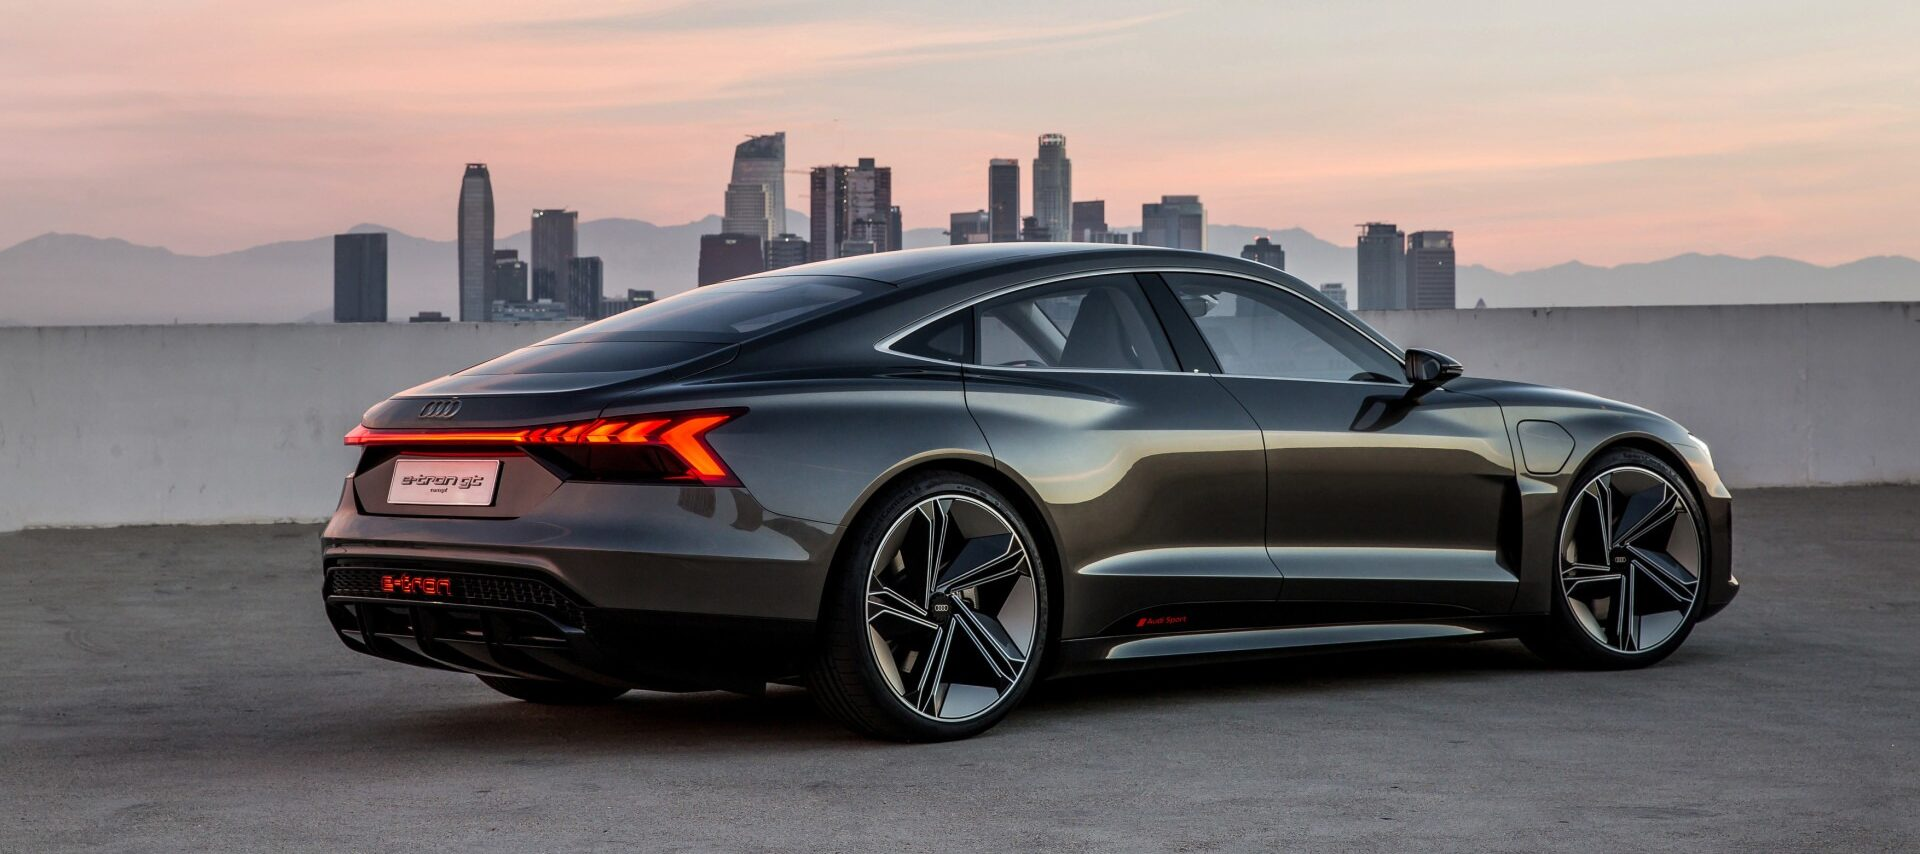 Alcoa fornecerá alumínio para as rodas do e-tron GT da Audi